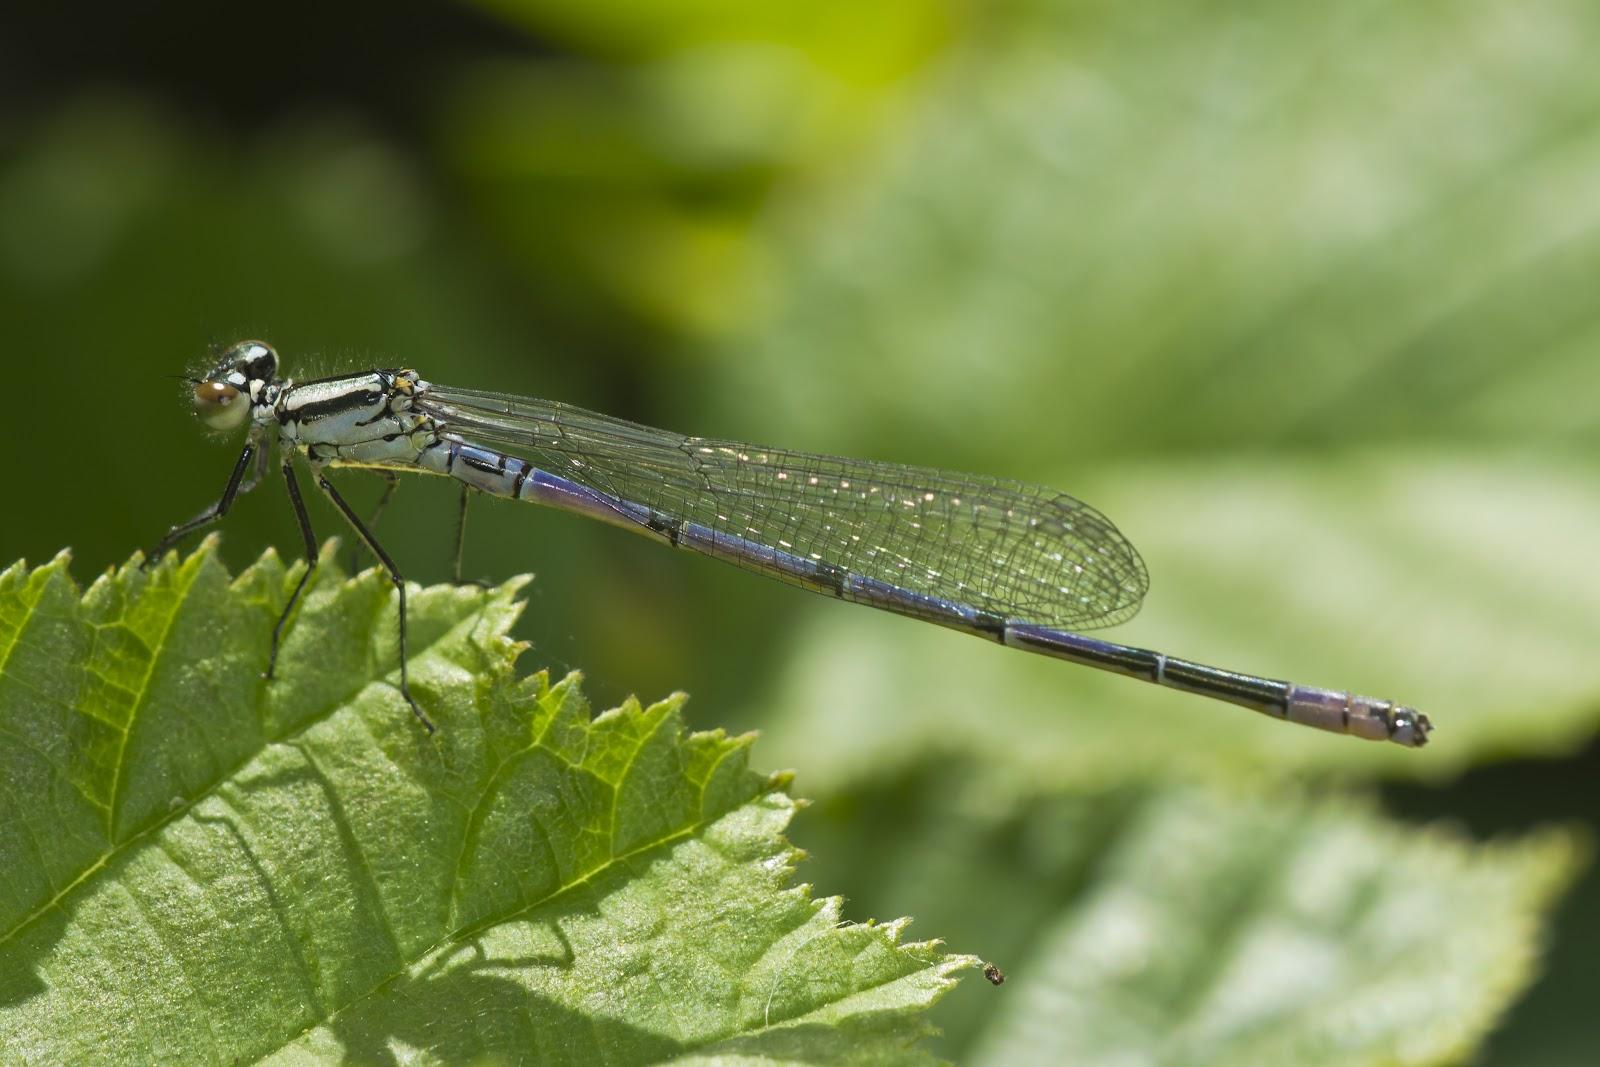 azure damsel flies fly - photo #43